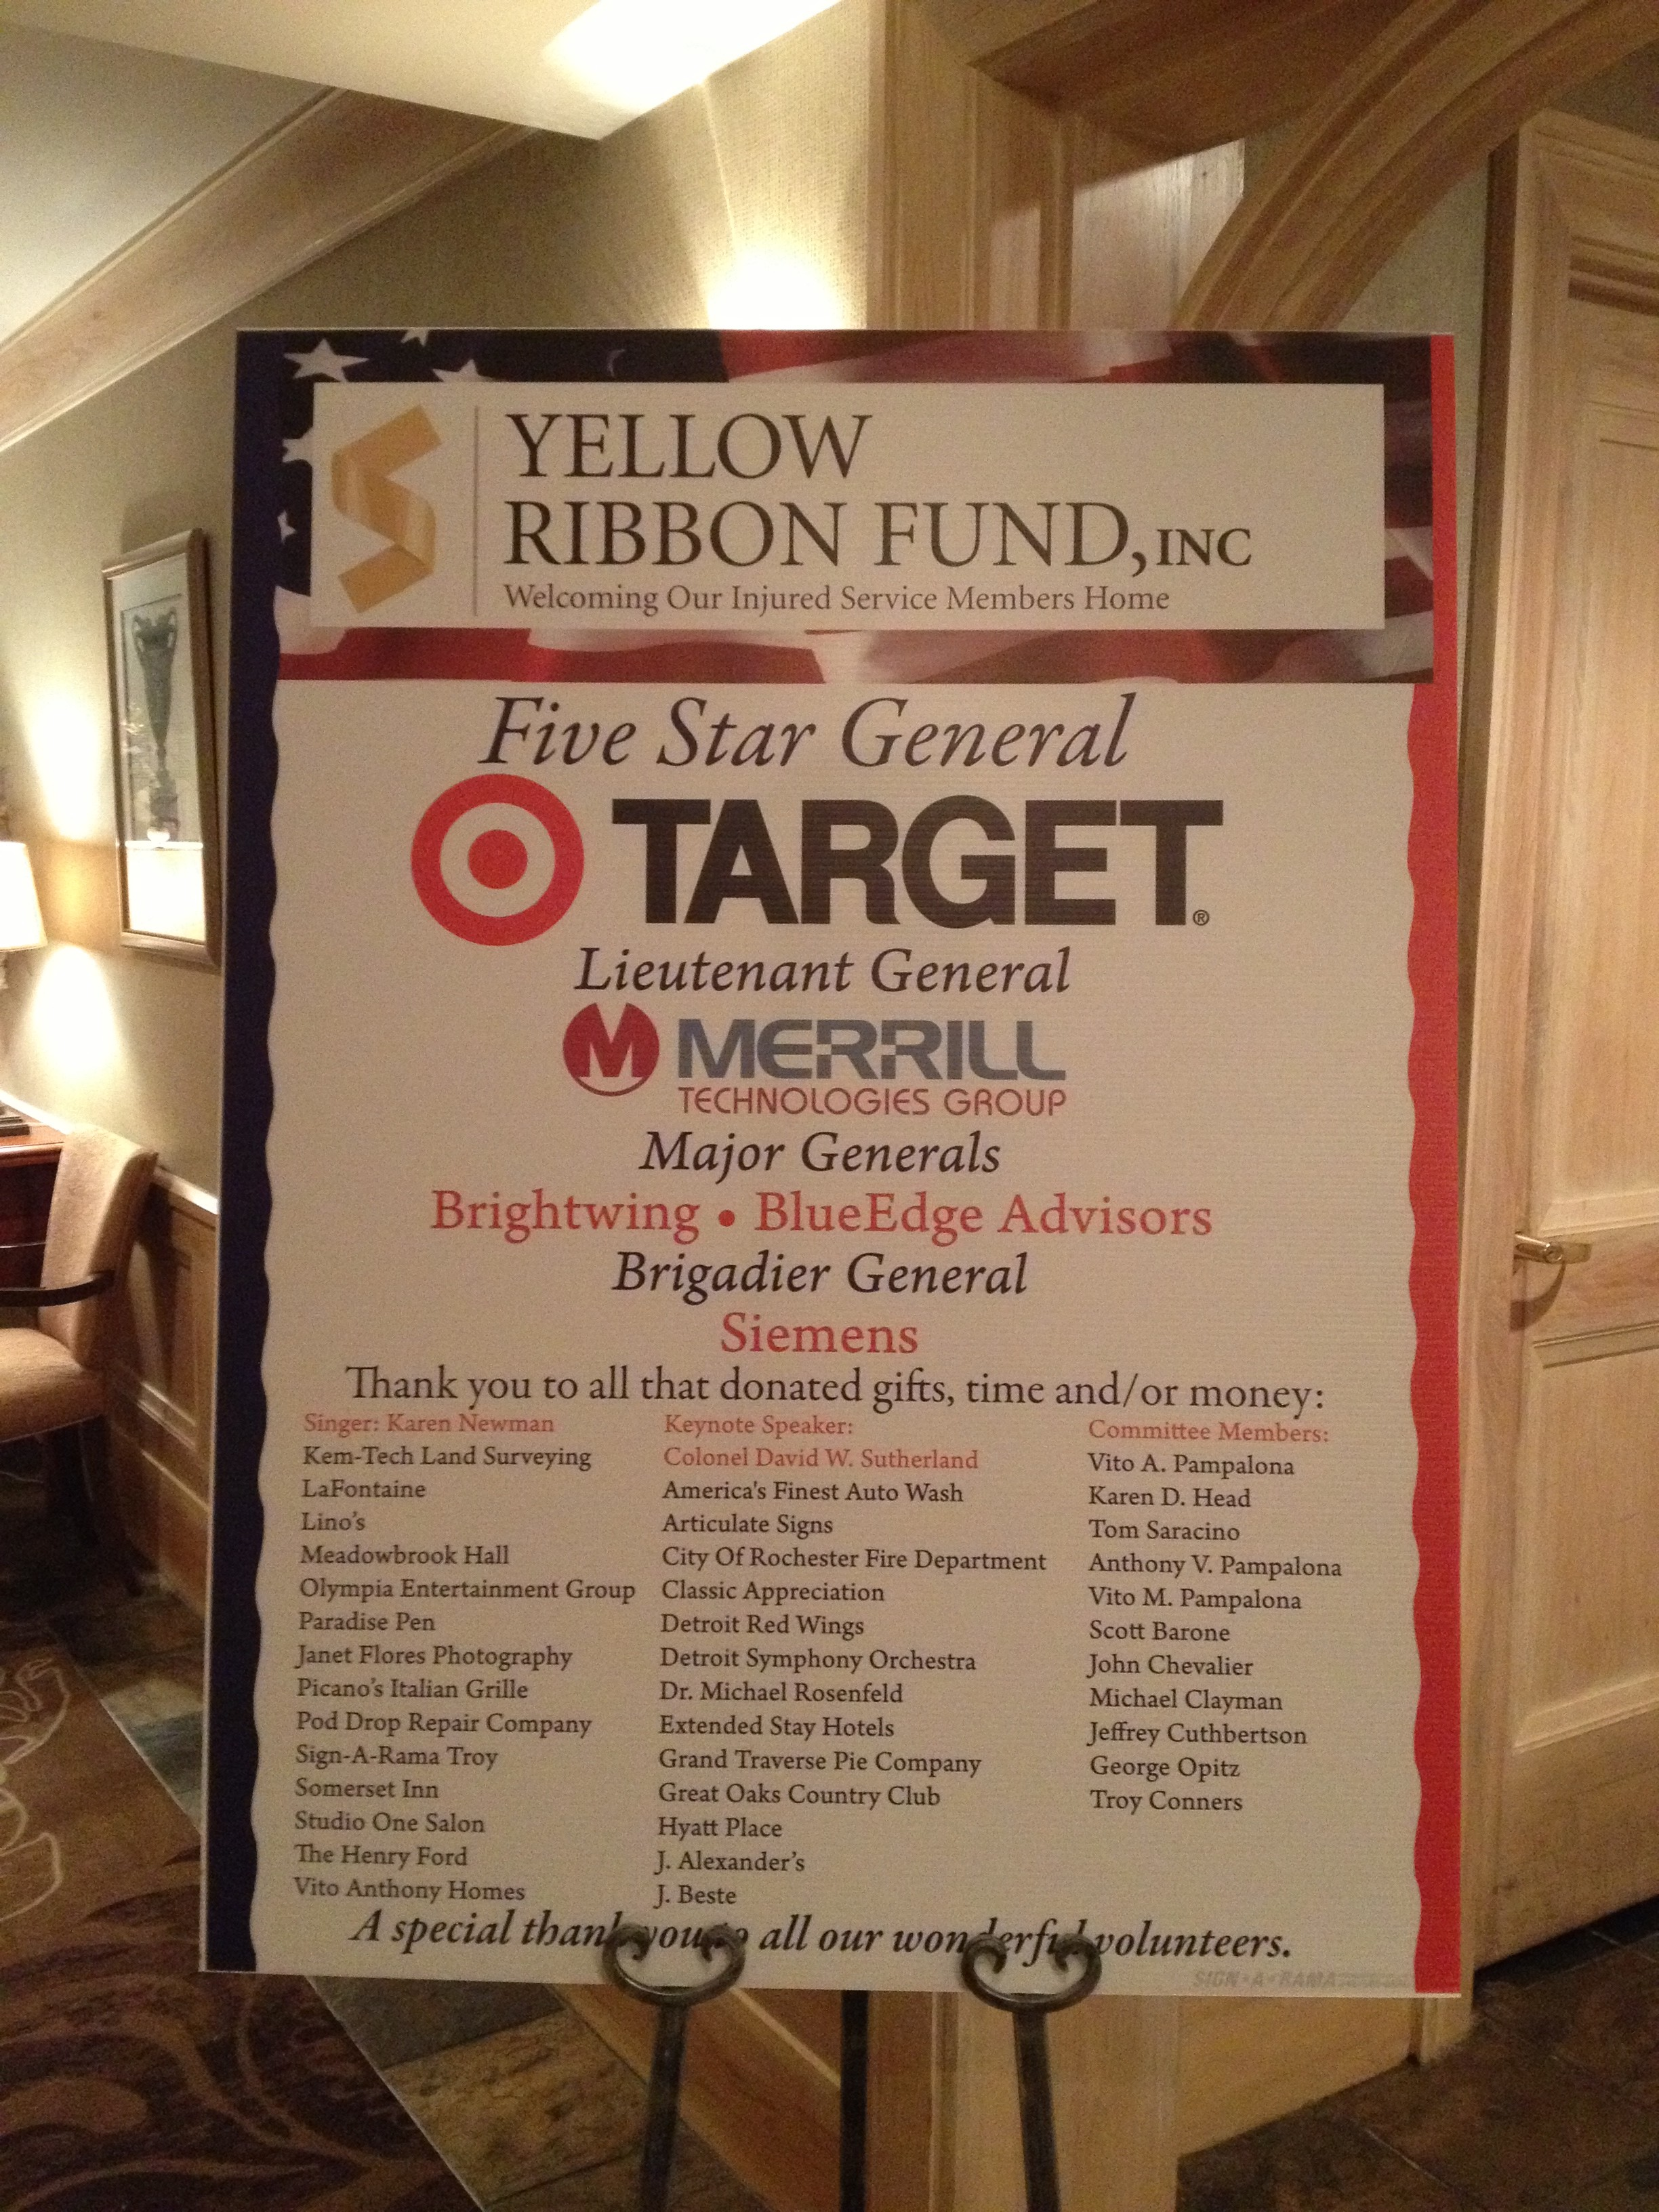 Signarama Troy supports the Yellow Ribbon Fund!